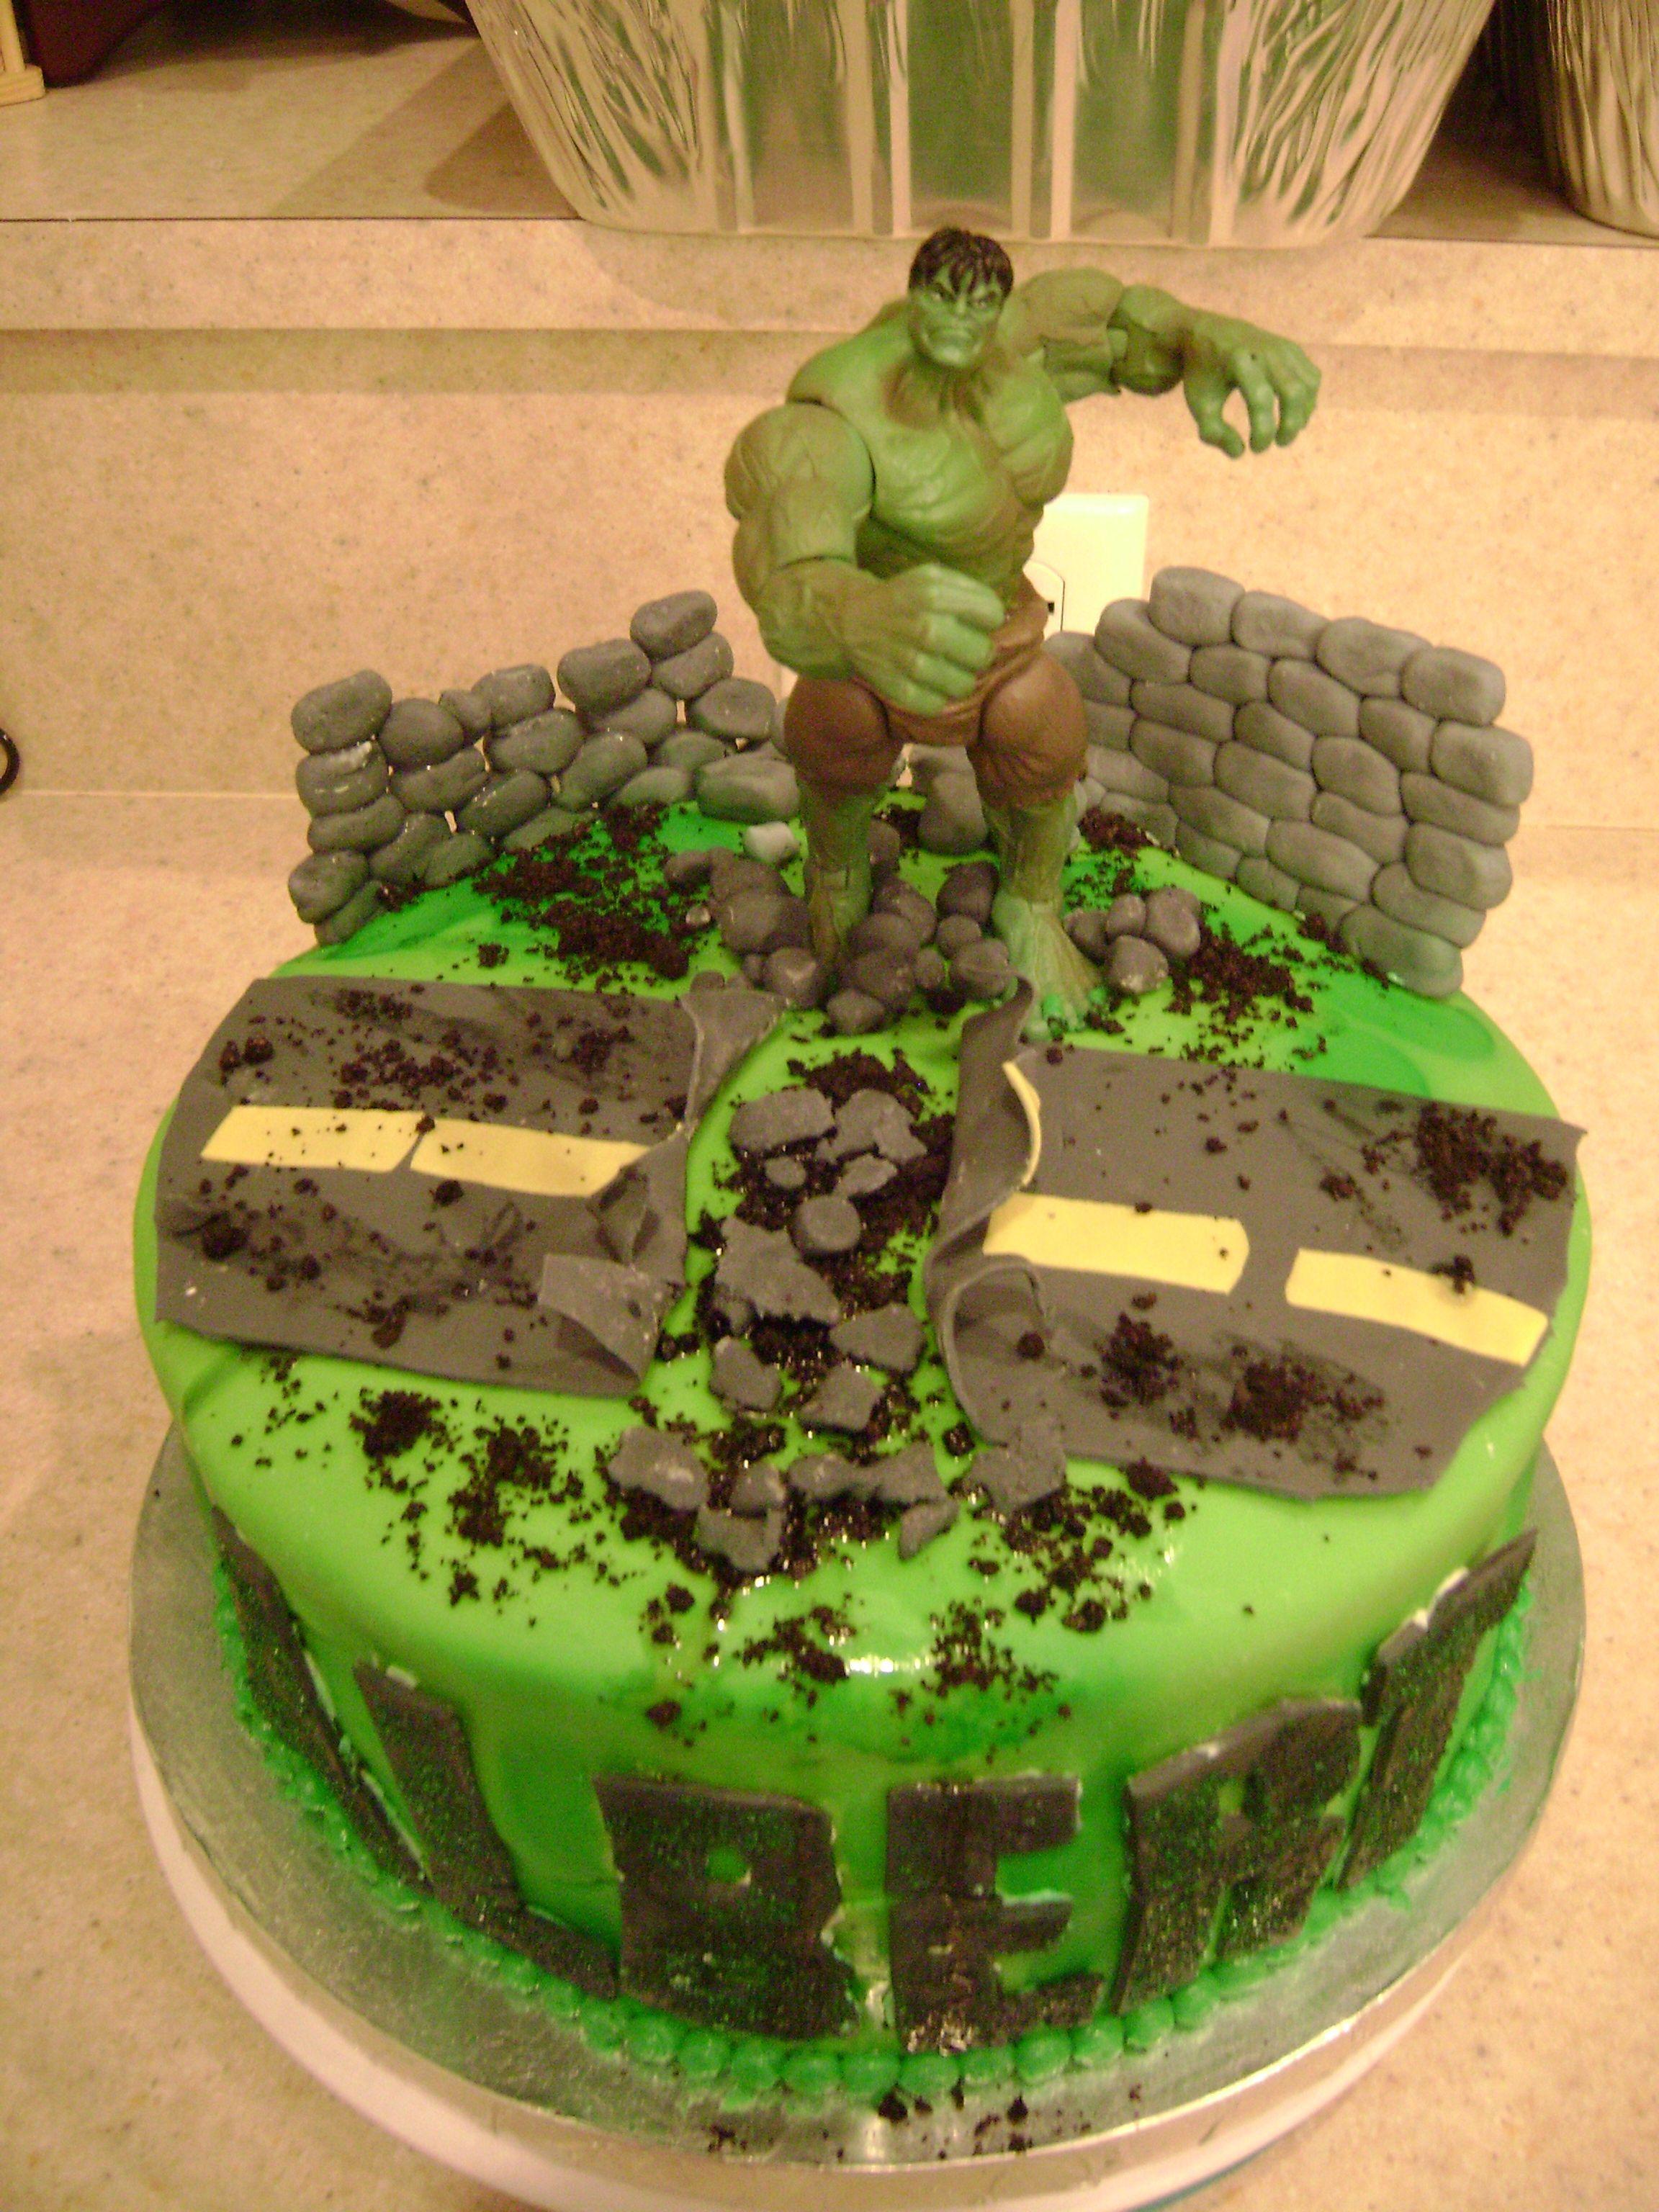 Sensational Hulk Smash Birthday Cake Hulk Birthday Cakes Hulk Cakes Hulk Funny Birthday Cards Online Elaedamsfinfo